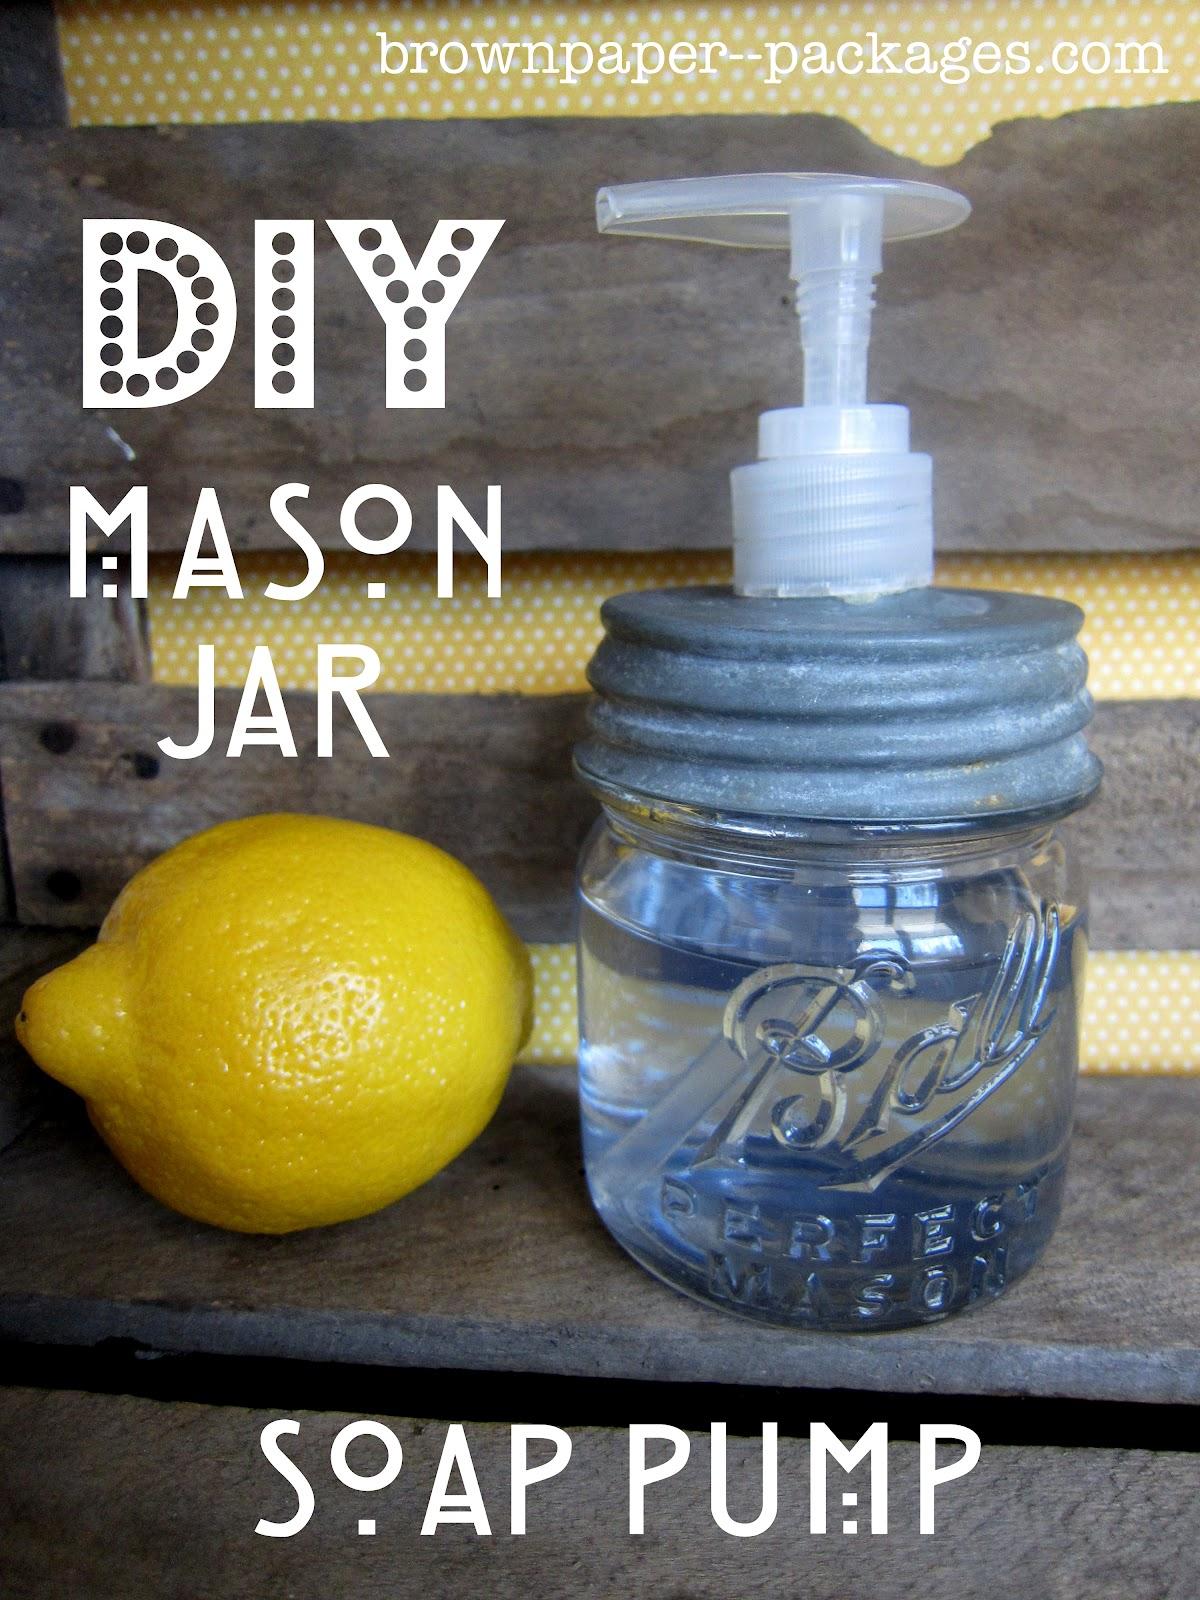 Diy mason jar soap pump.